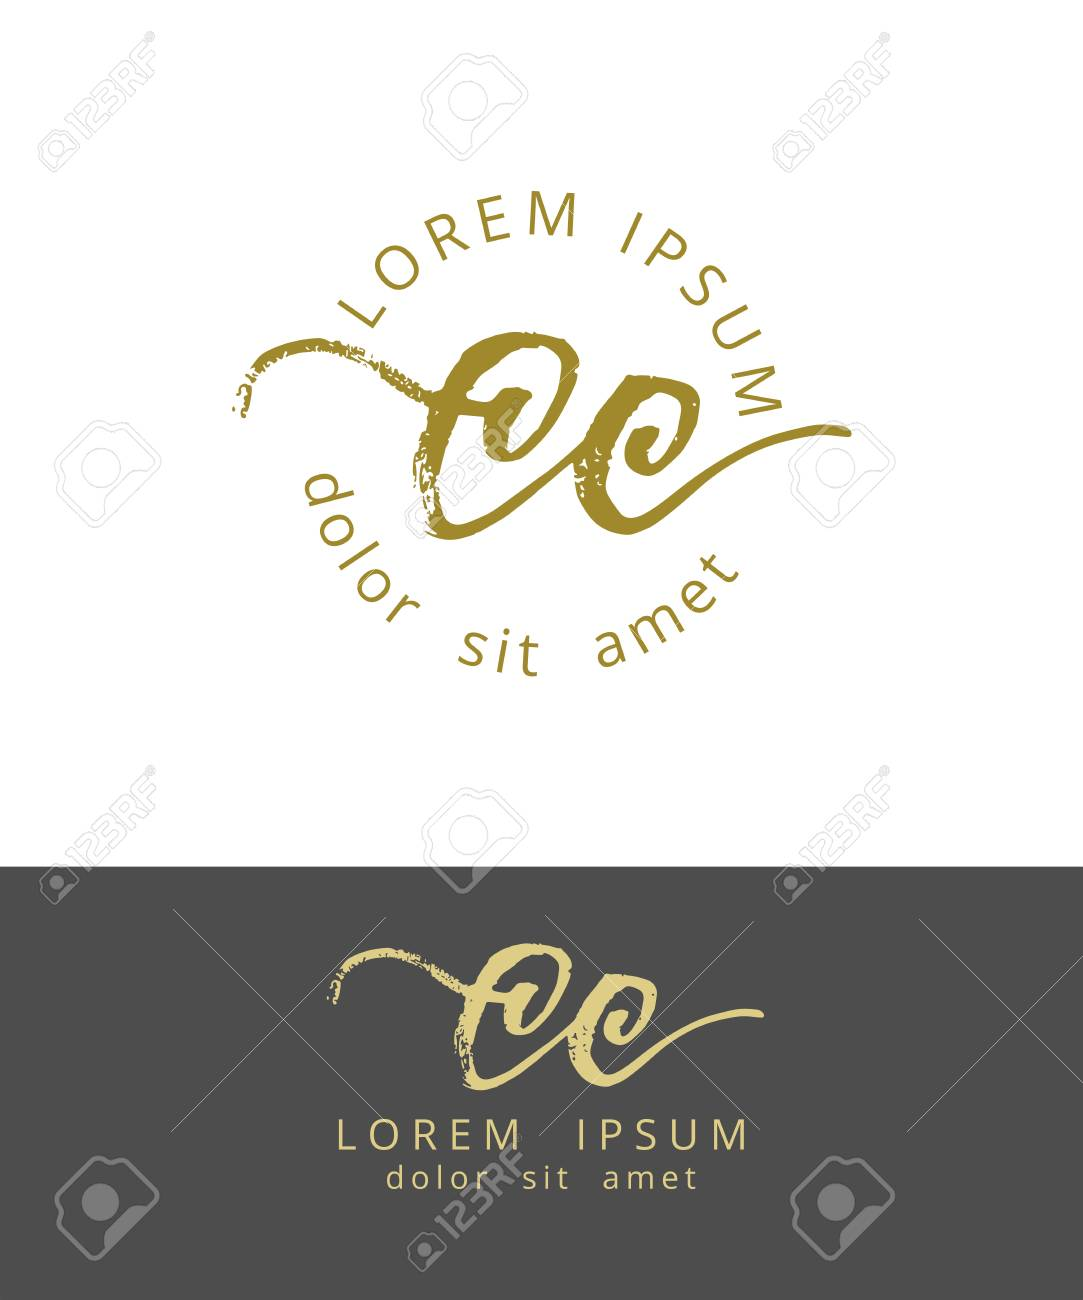 C C Initials Monogram Logo Design Dry Brush Calligraphy Royalty Free Cliparts Vectors And Stock Illustration Image 96745962